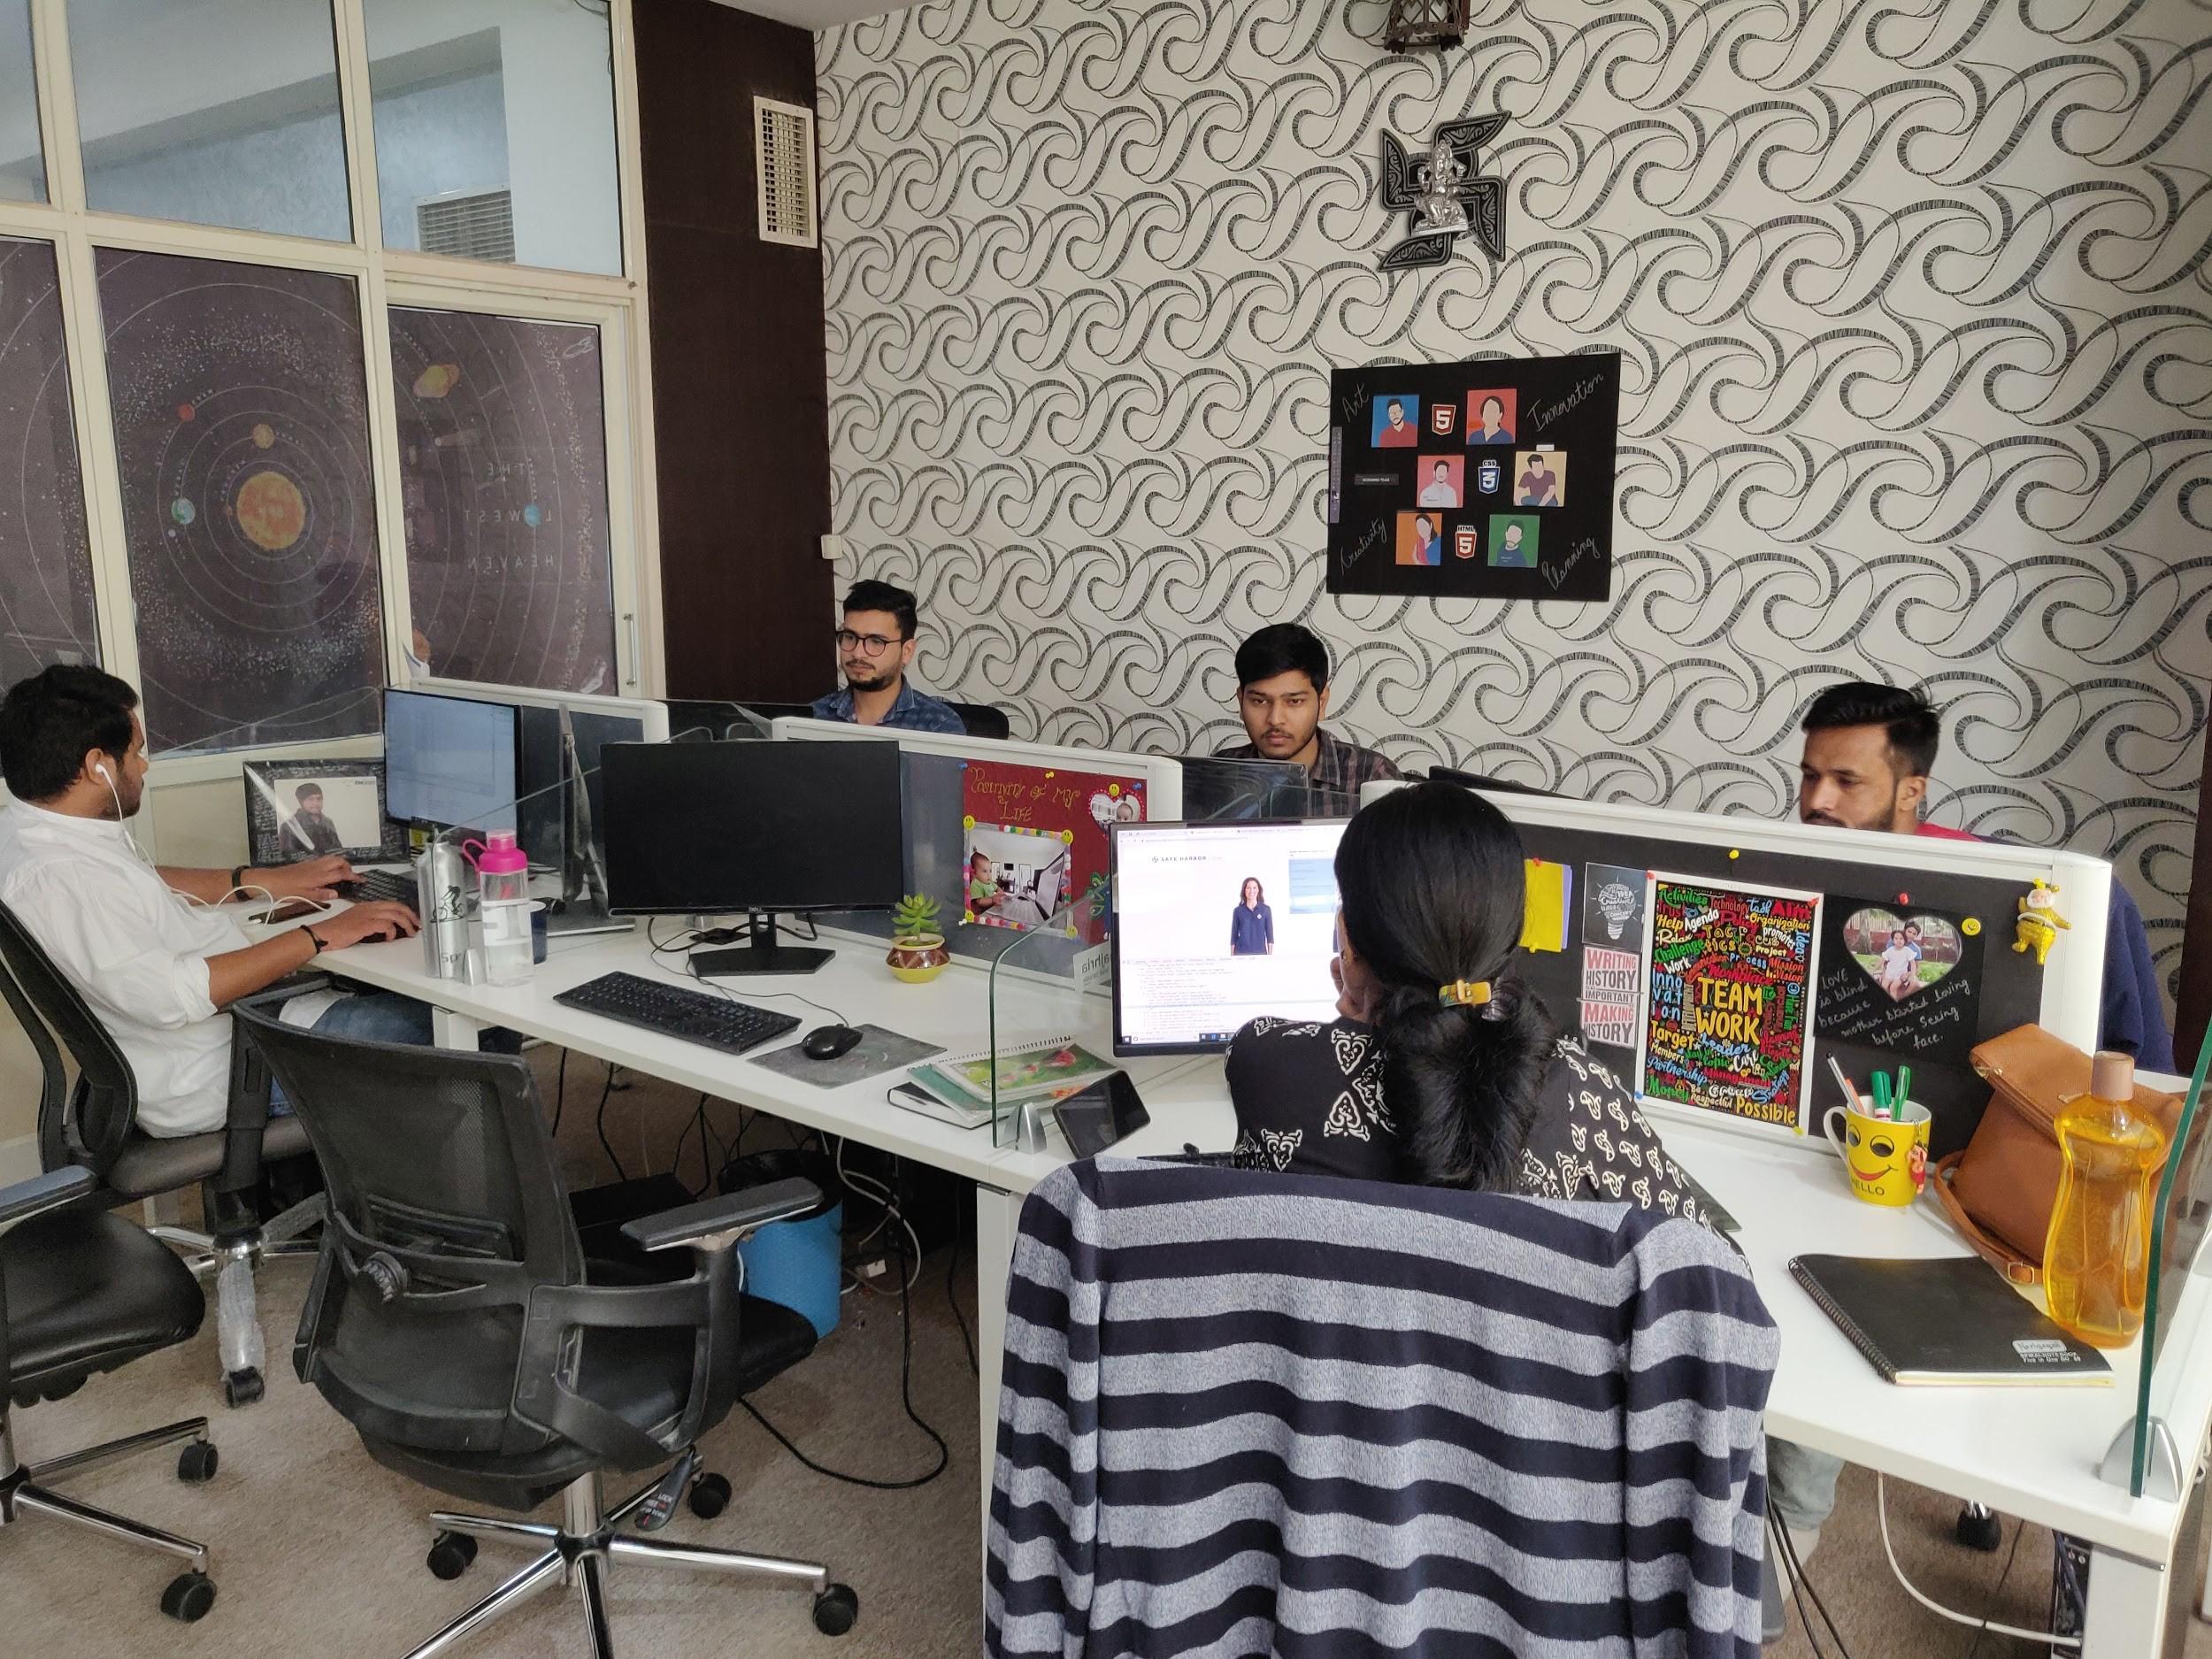 Team Web Developers